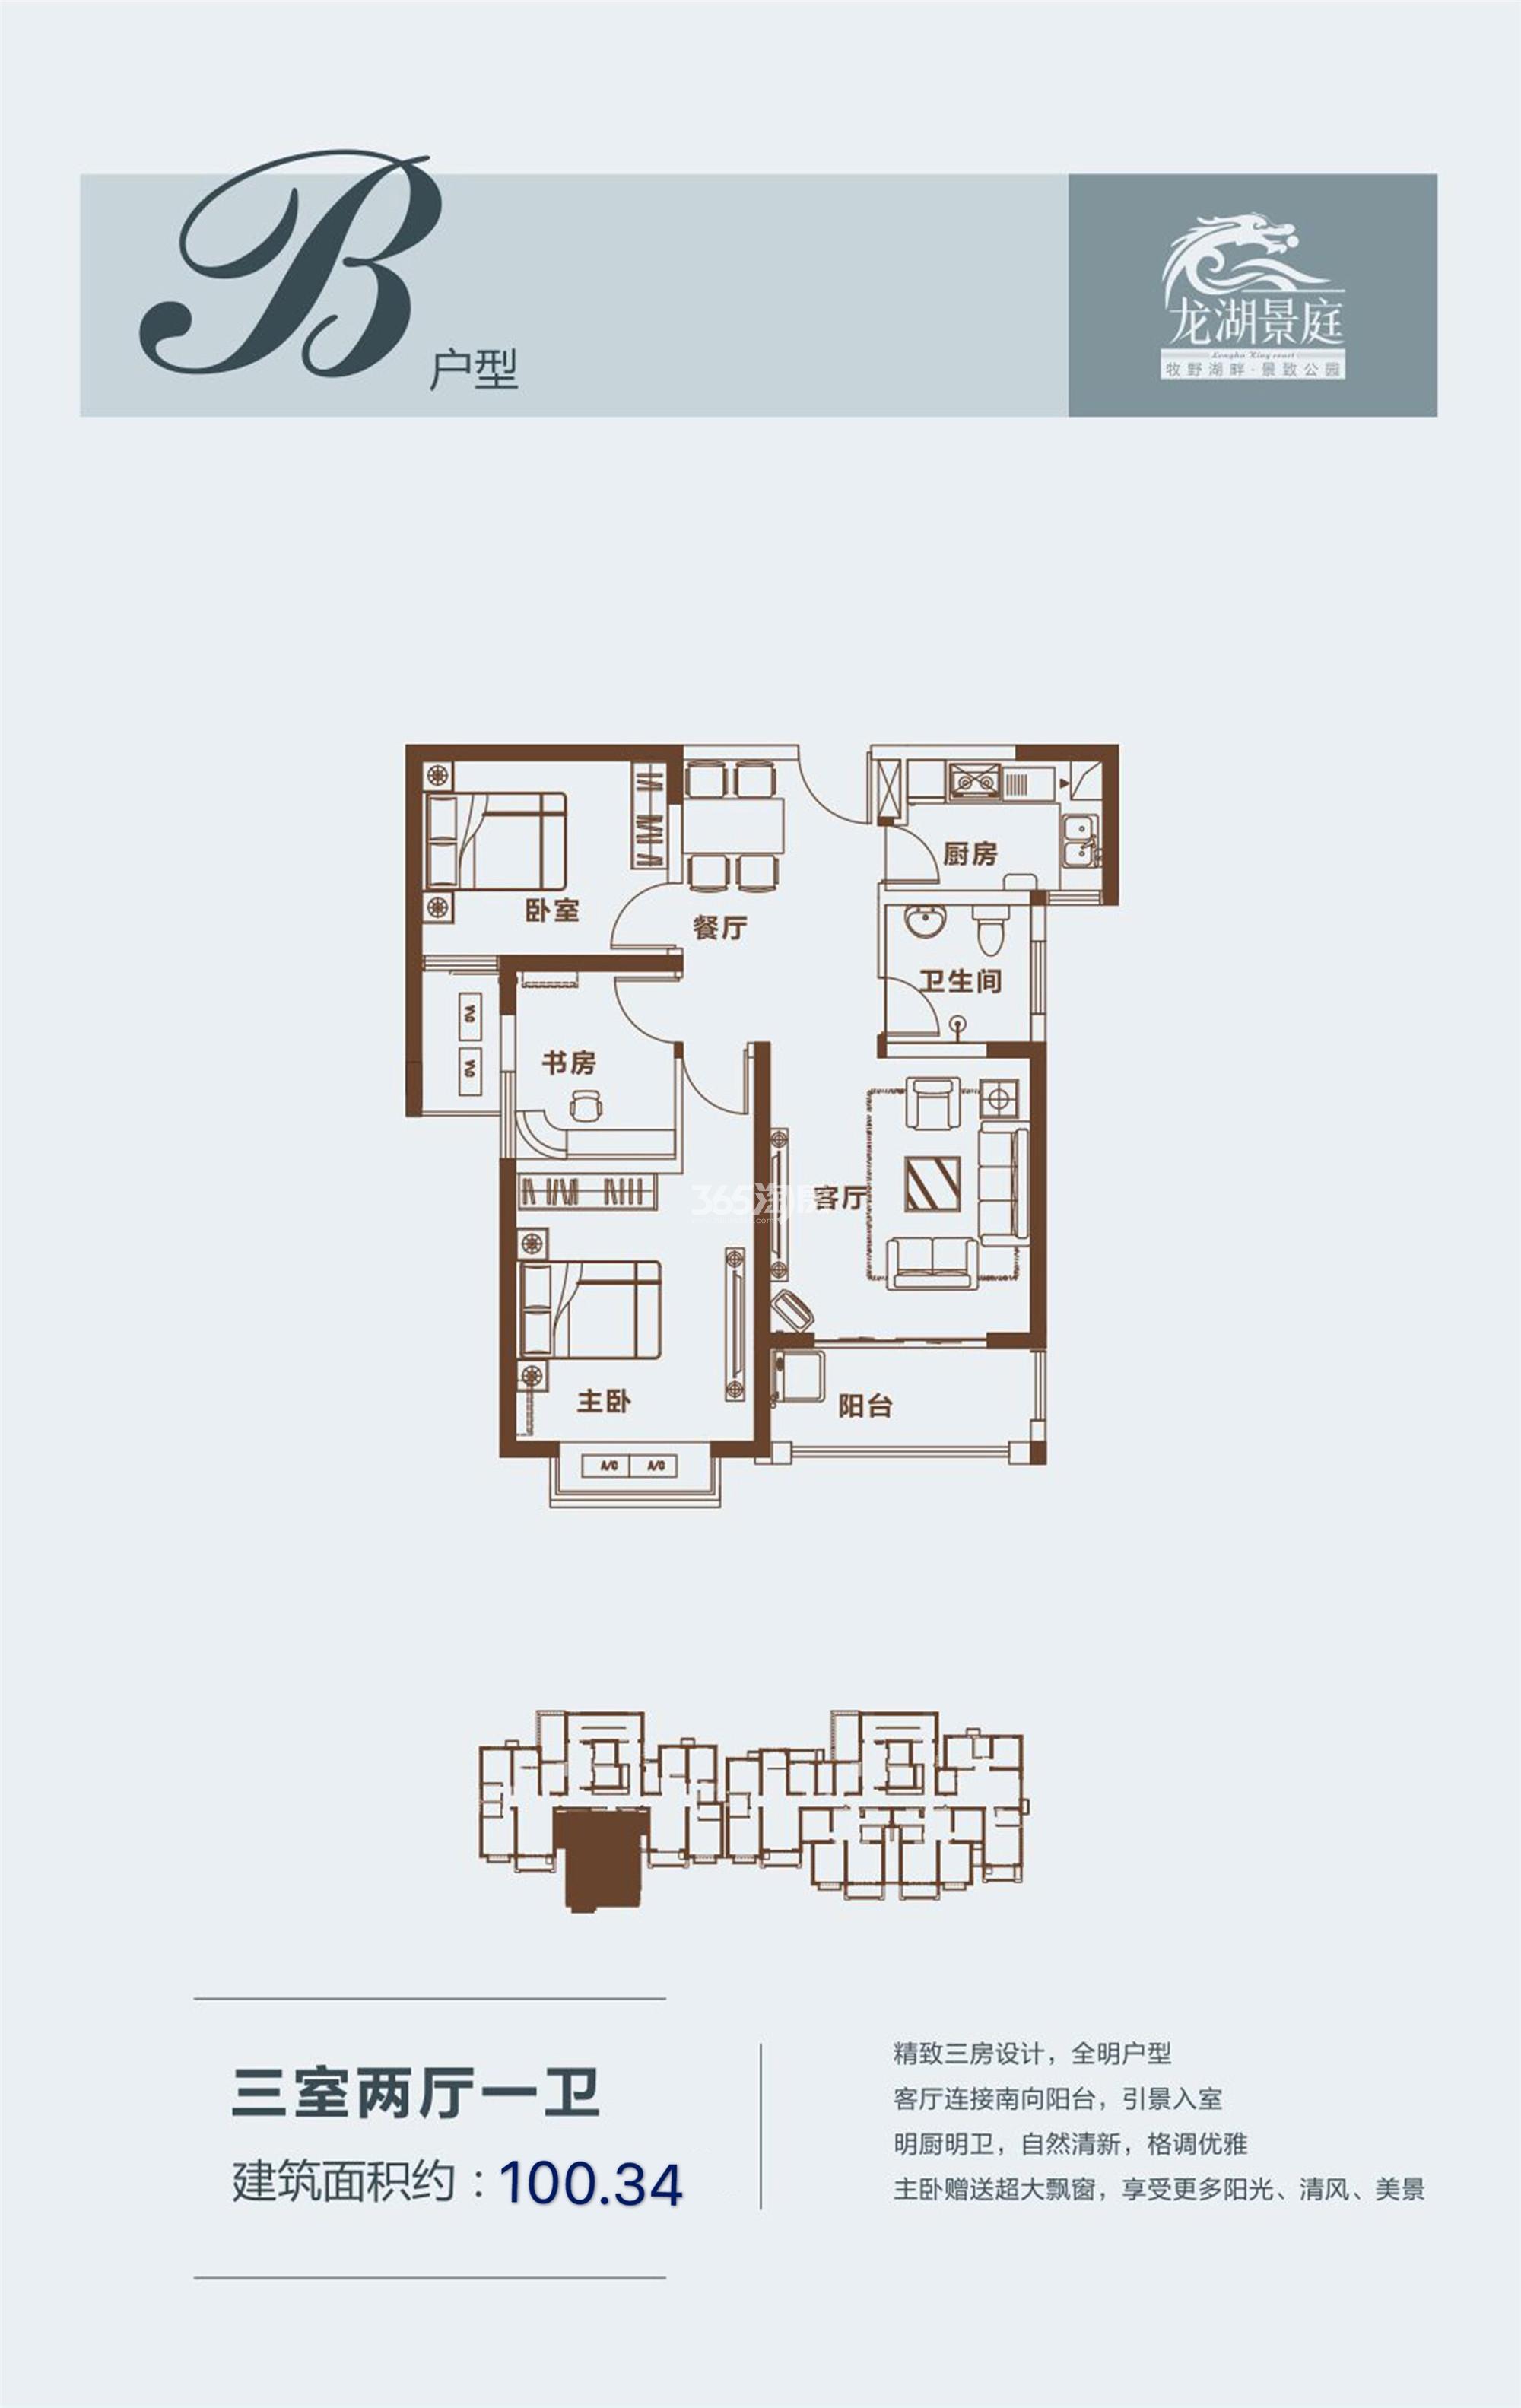 B户型图三室两厅一卫